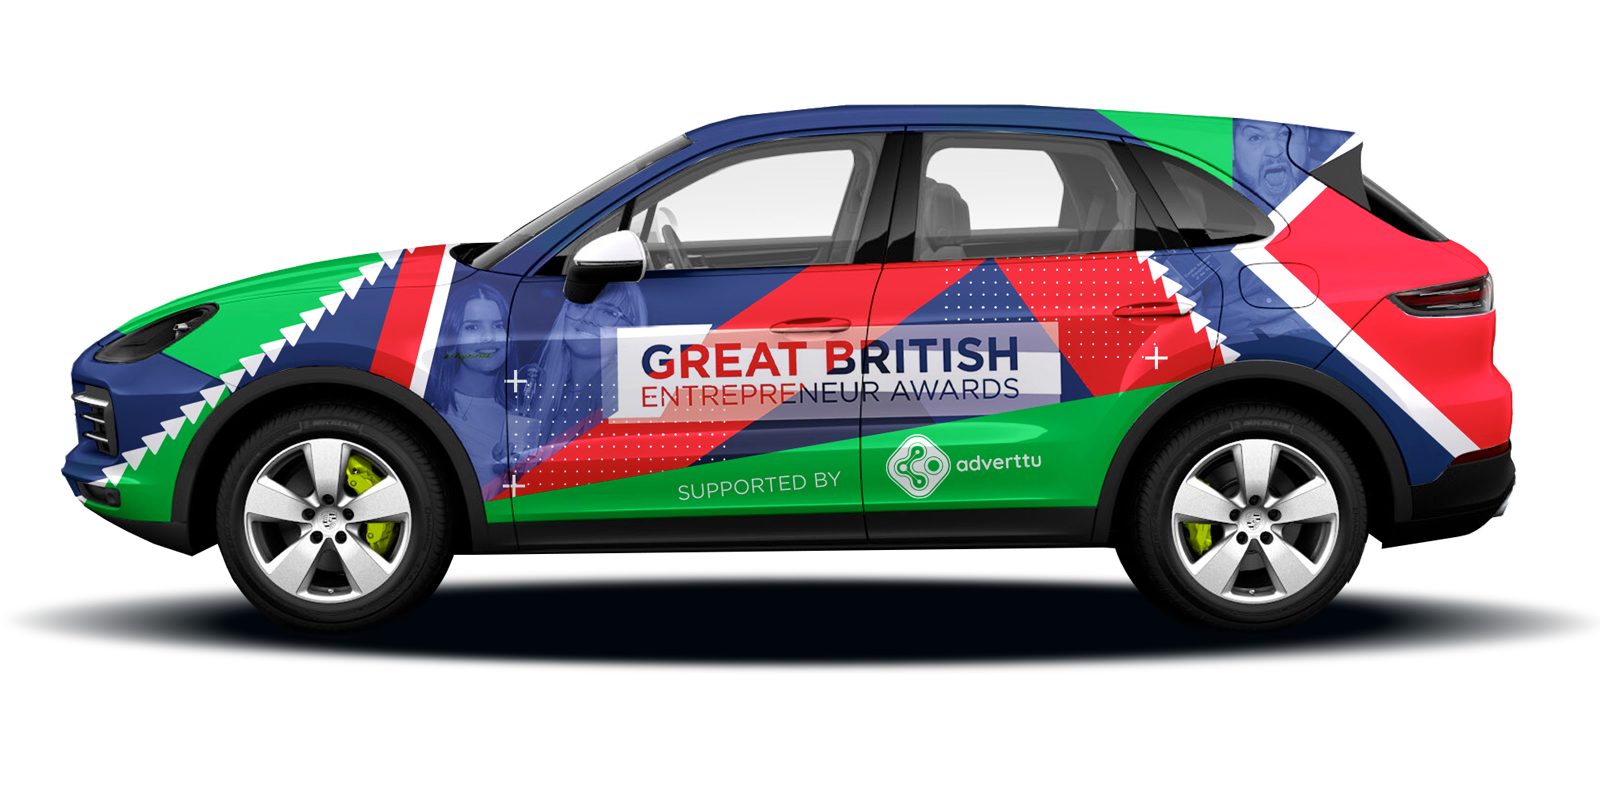 Great British Entrepreneur Awards mockup by Adverttu